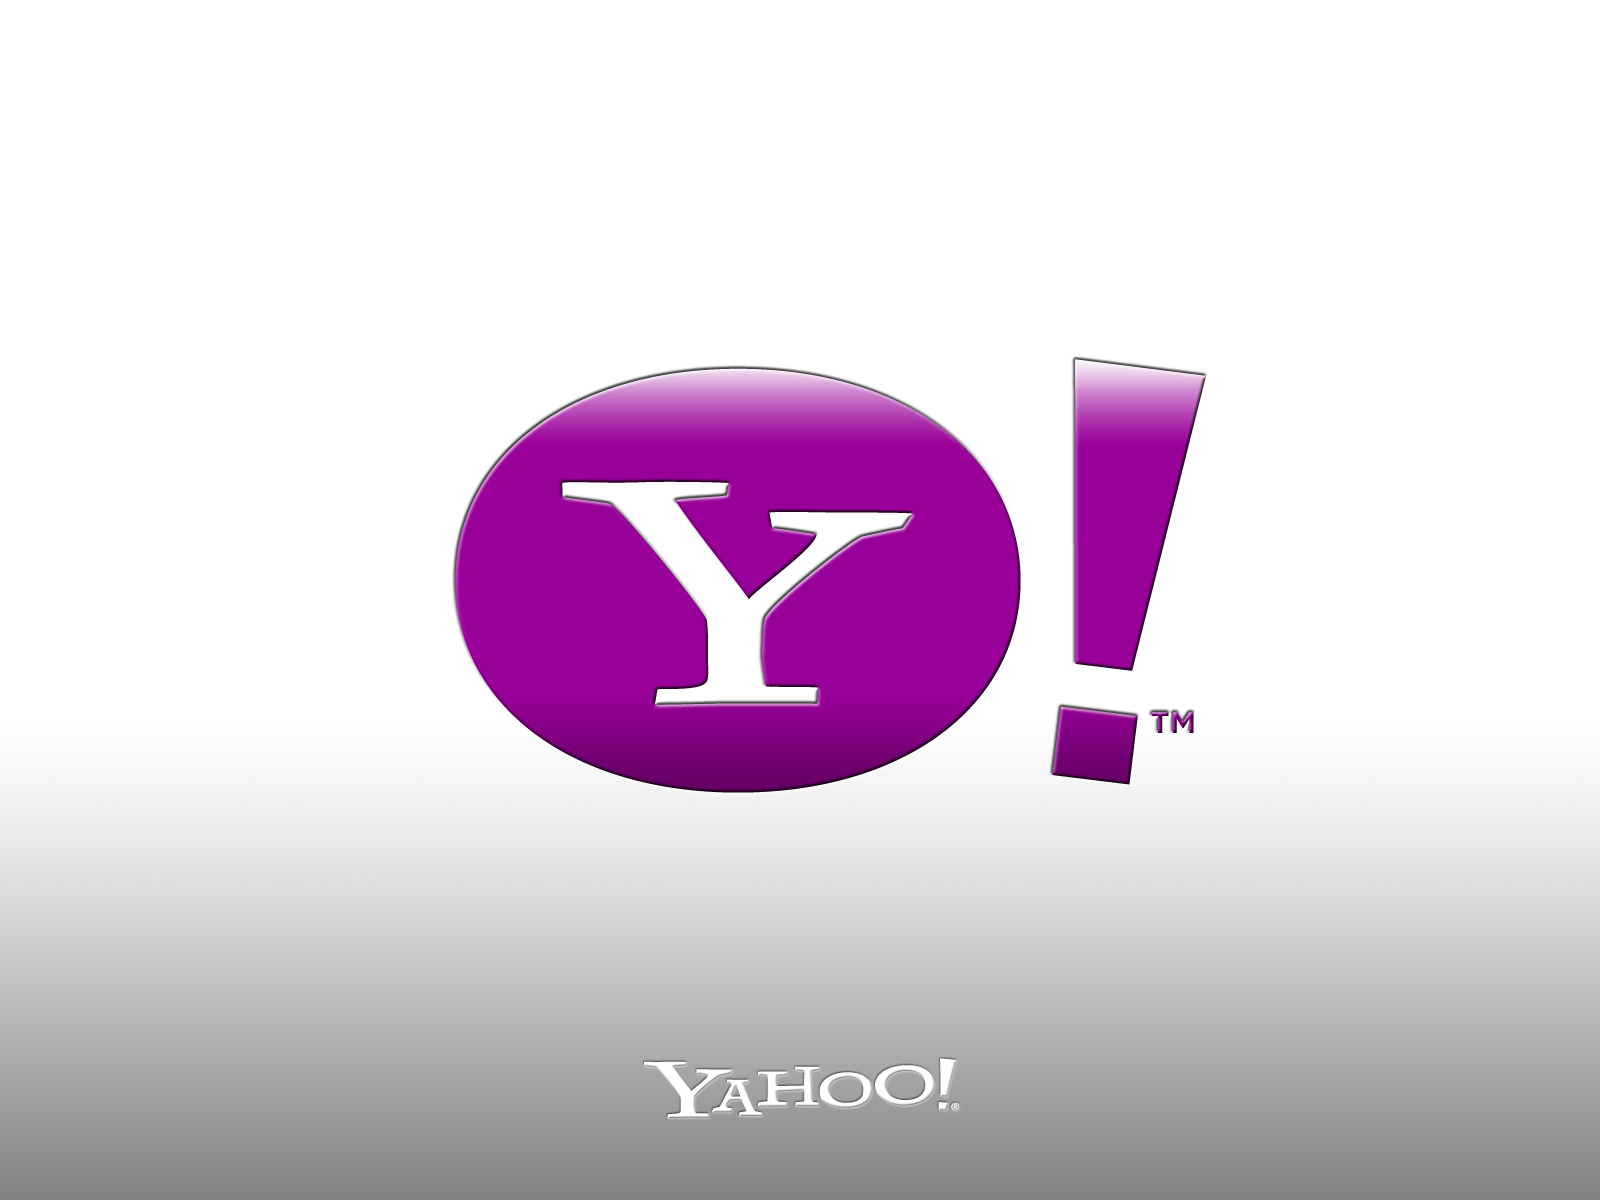 Yahoo Wallpaper 11   1600 X 1200 stmednet 1600x1200